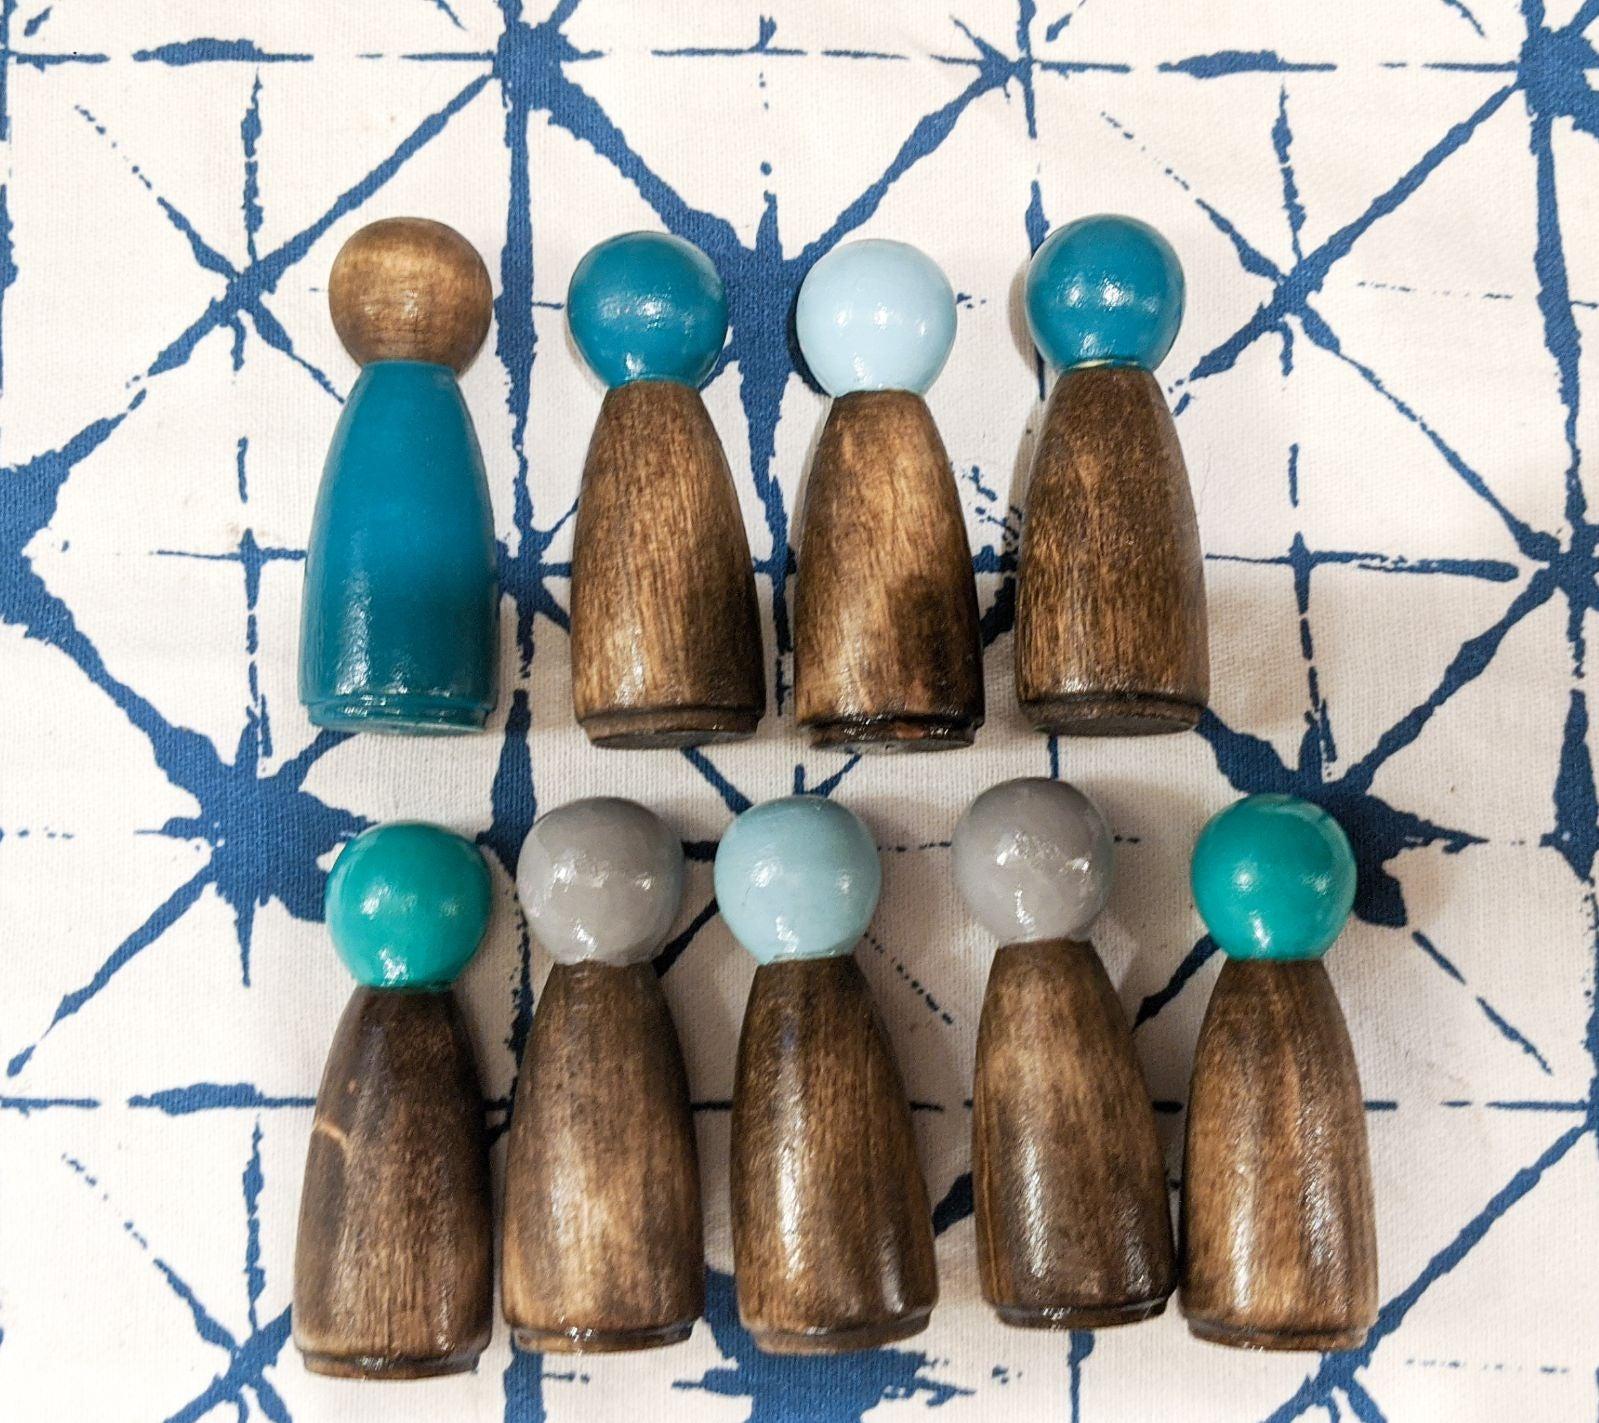 Set of 9 wooden peg dolls